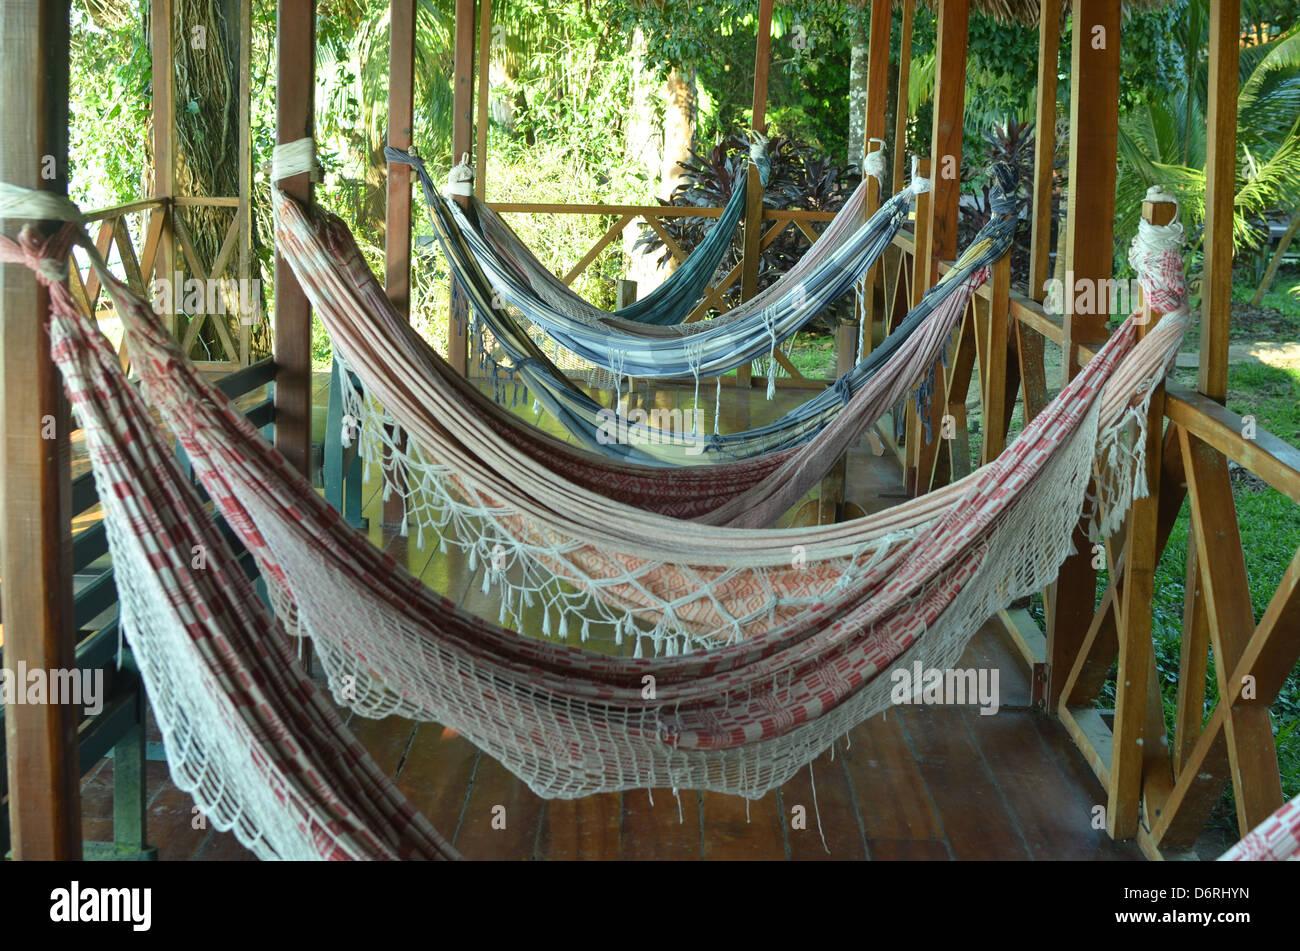 hammocks at a jungle lodge in the amazon rainforest hammocks at a jungle lodge in the amazon rainforest stock photo      rh   alamy